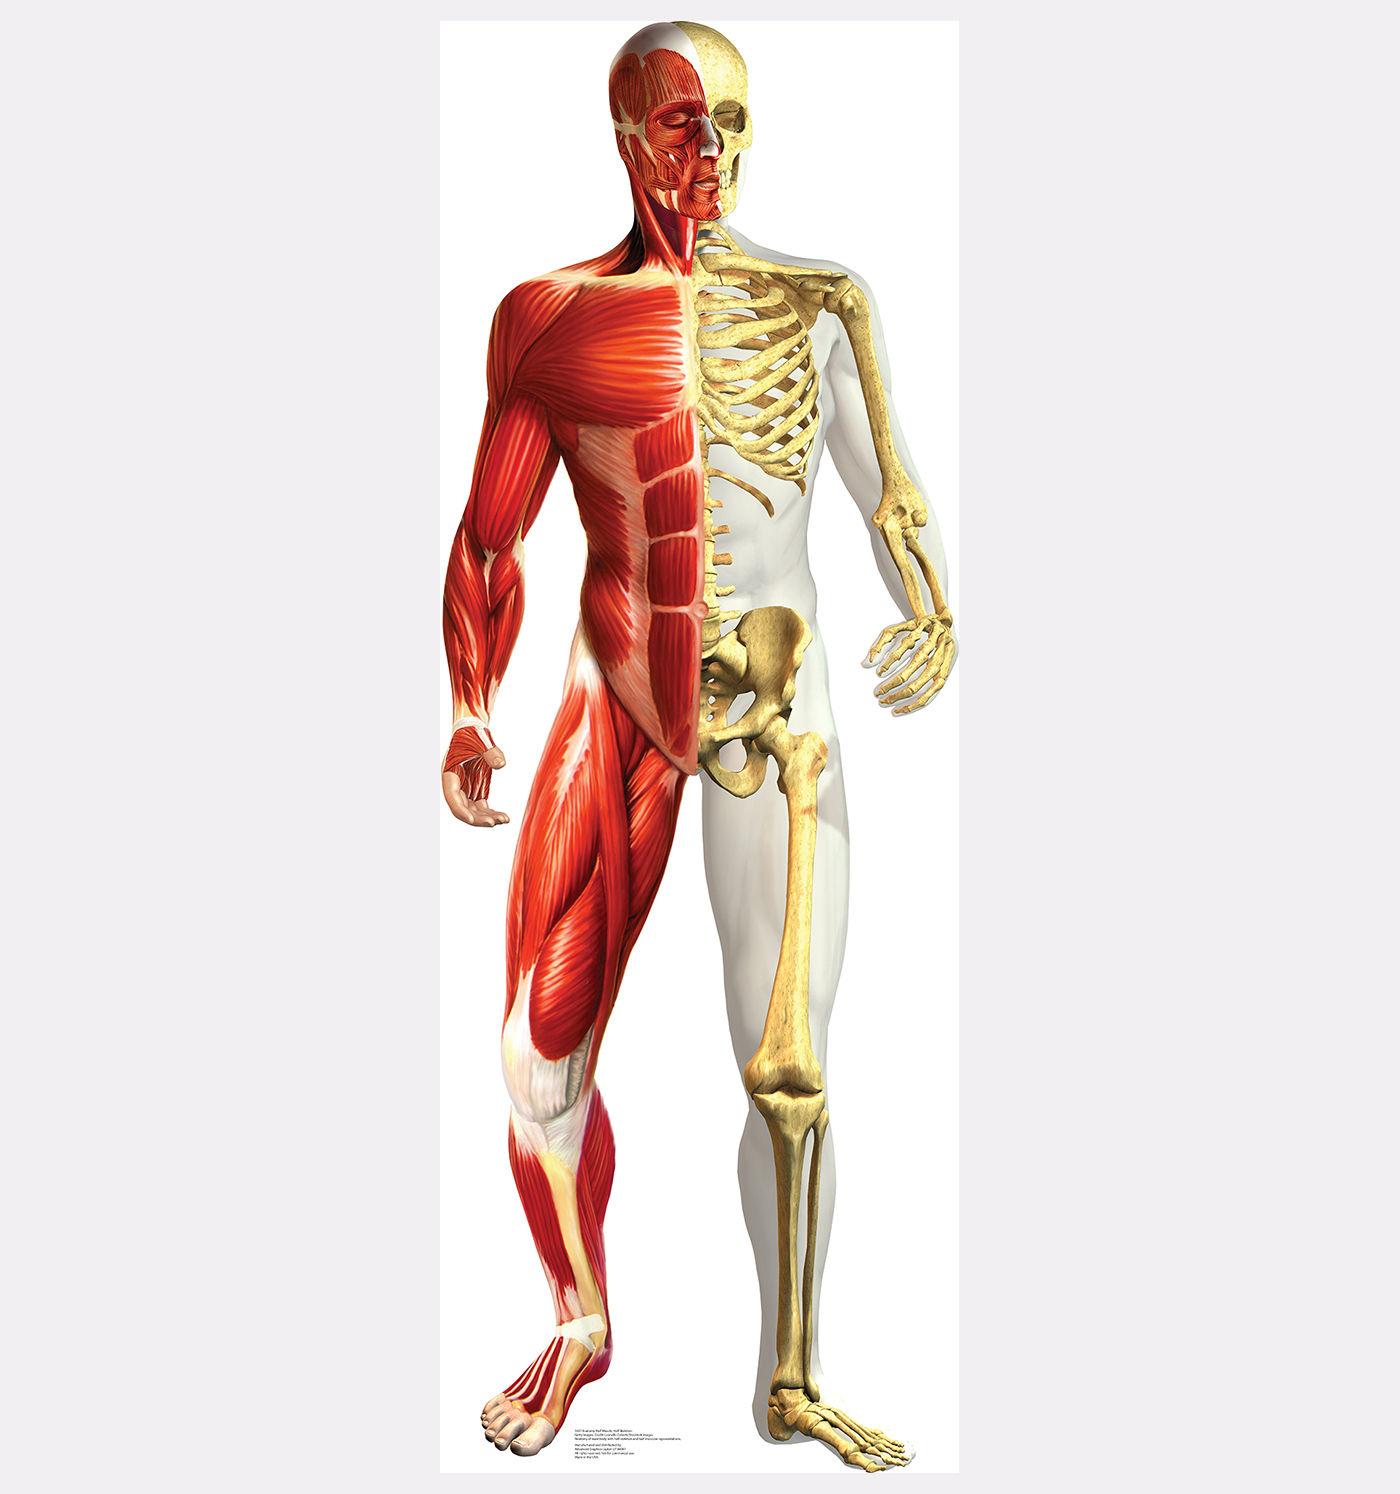 Anatomy Half Muscle Skeleton Lifesize Standup Standee Cardboard